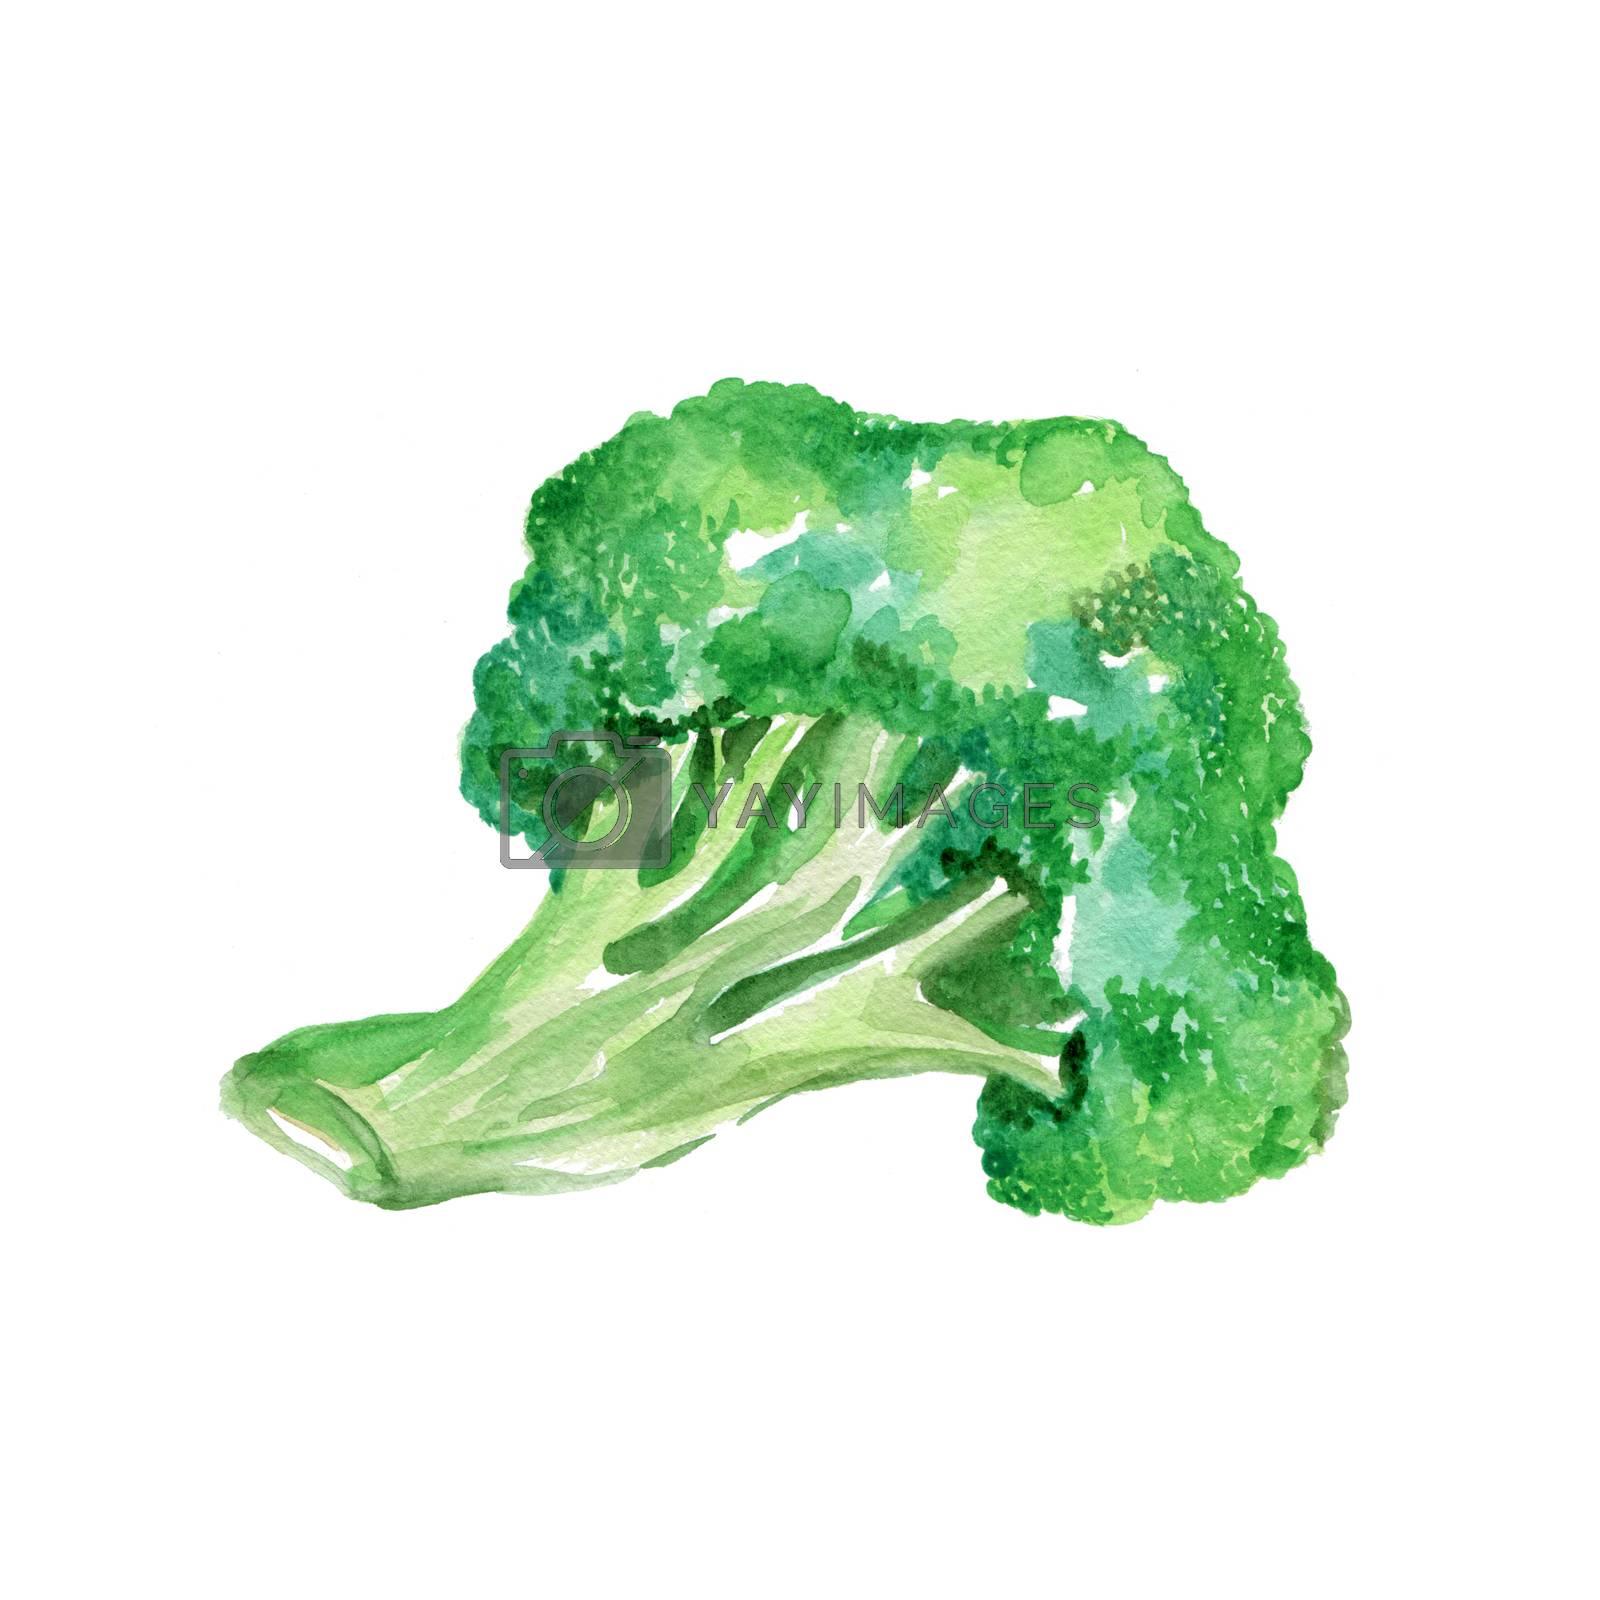 Watercolor Broccoli. Hand Drawn Illustration Organic Food Vegetarian Ingredient